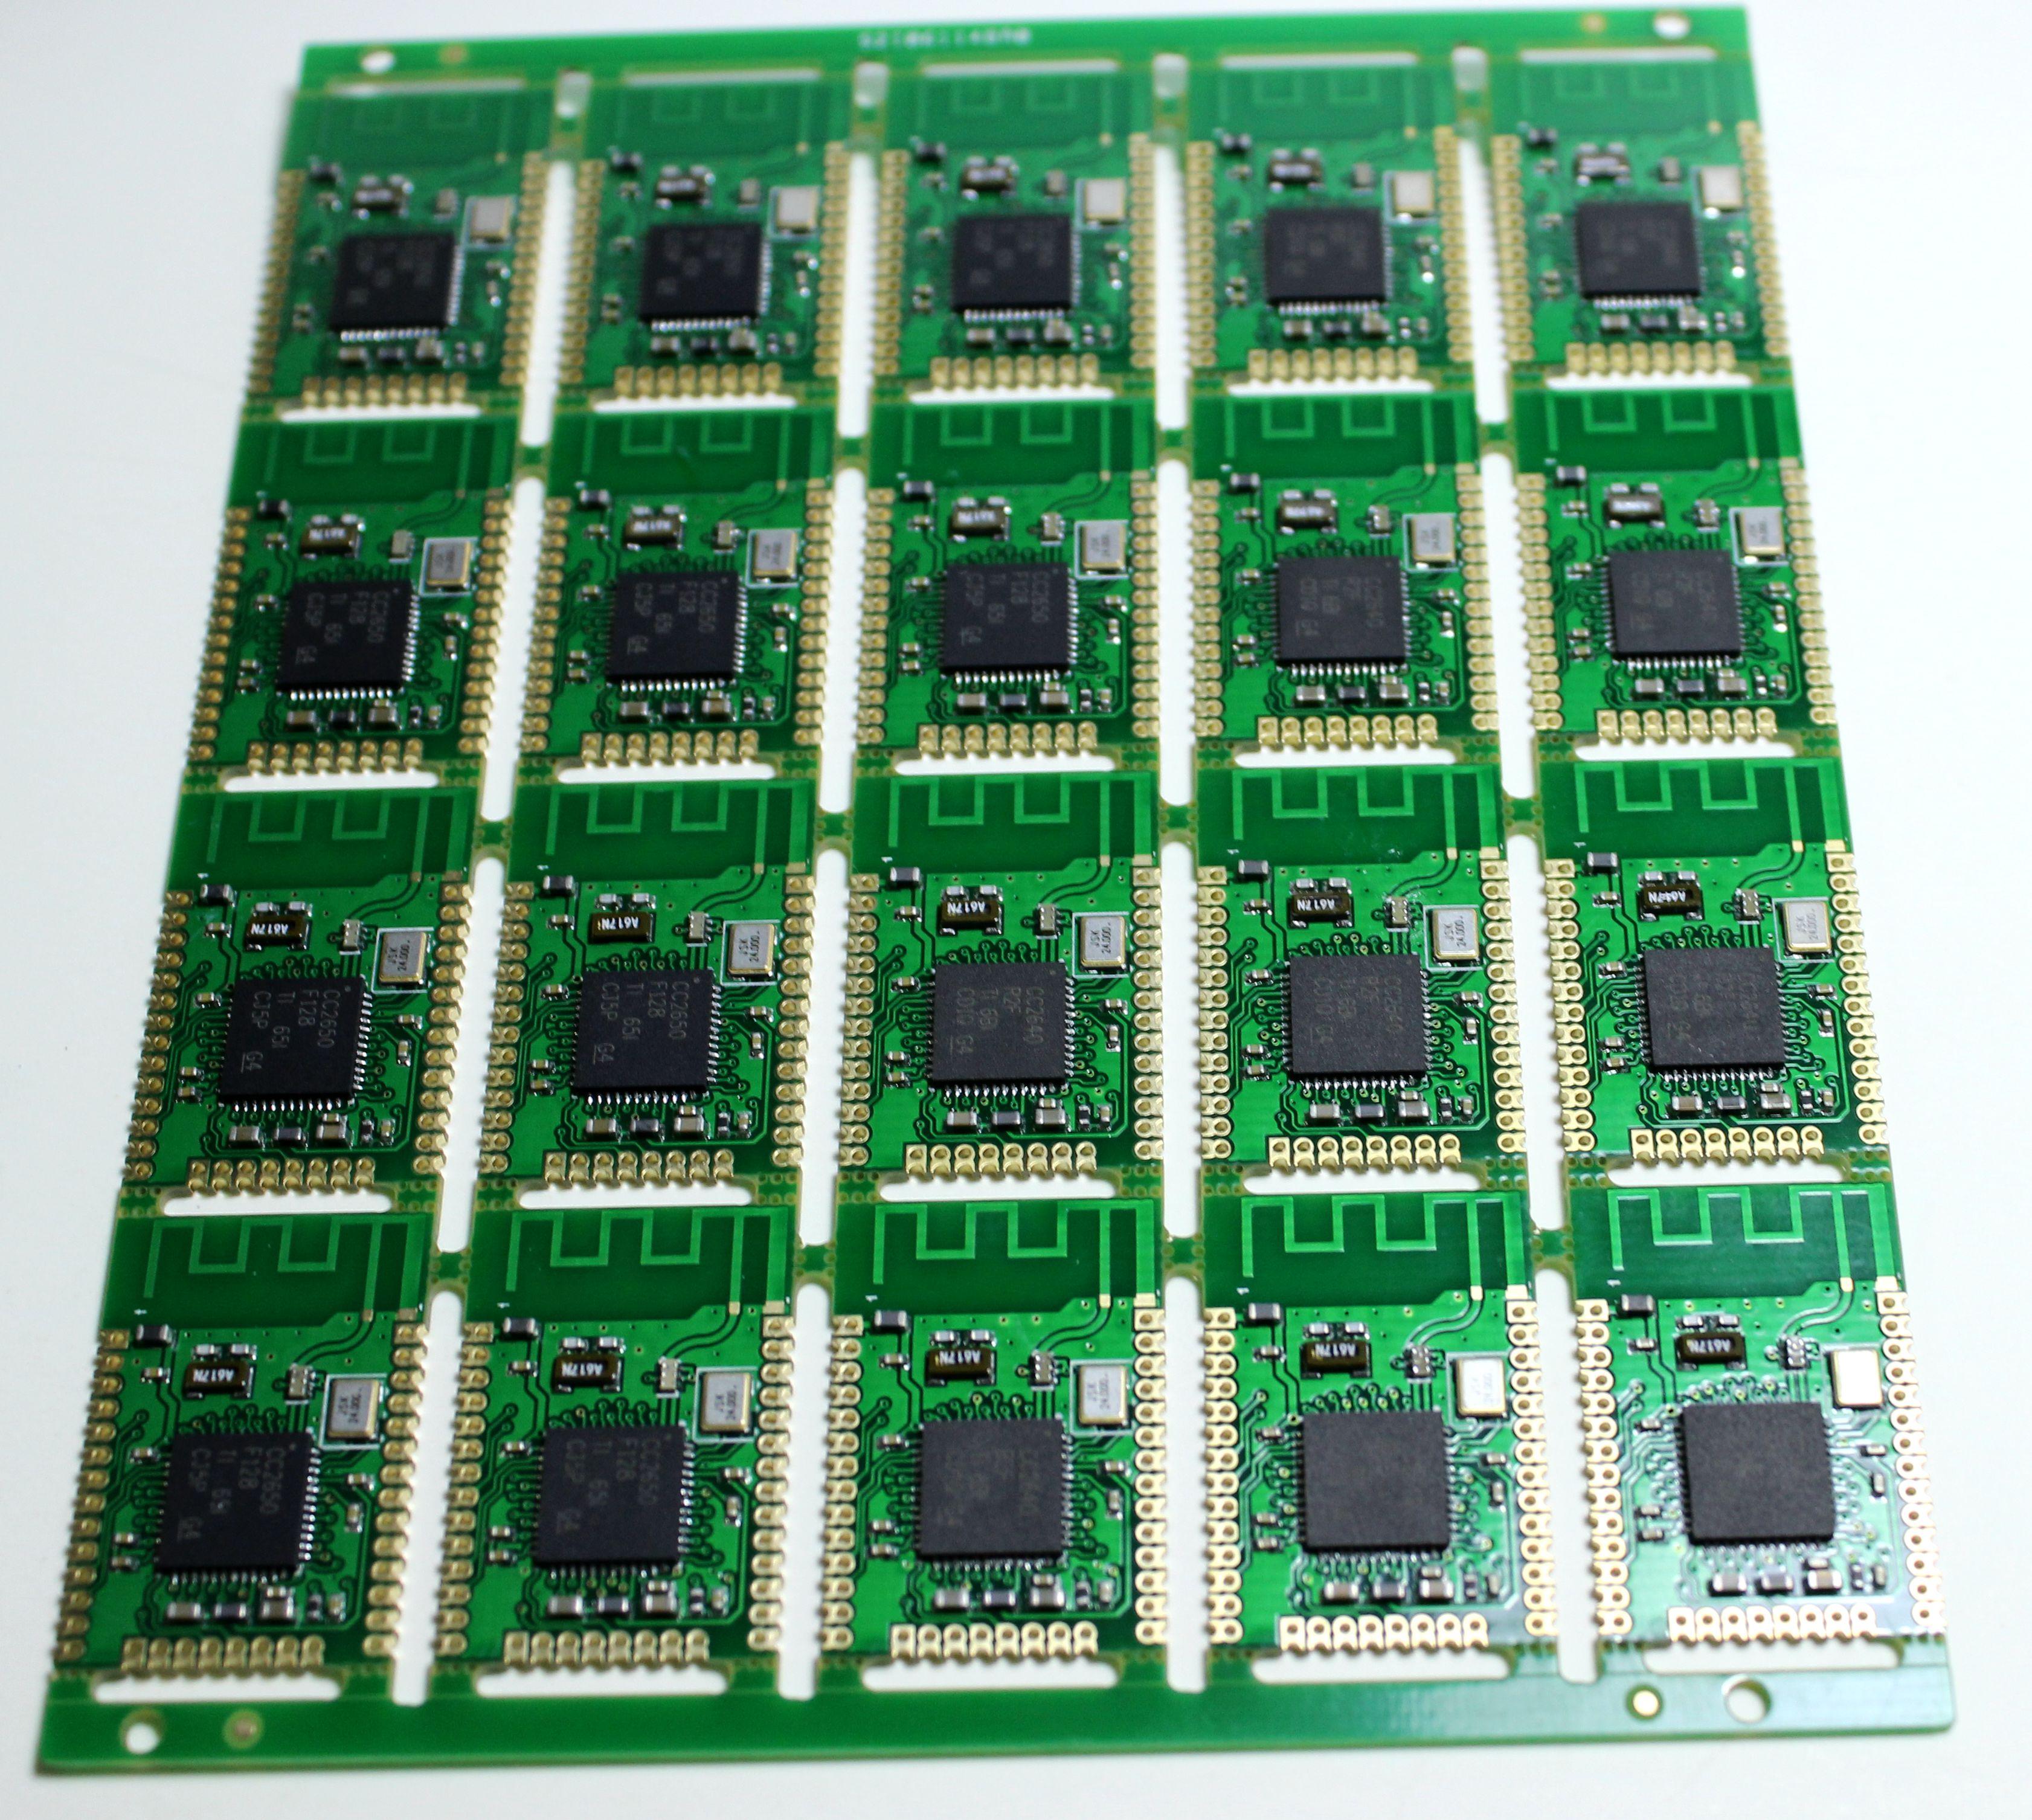 20pcs The CC2650 PA module of the CC2650 RGZ module Zigbee module BLE module